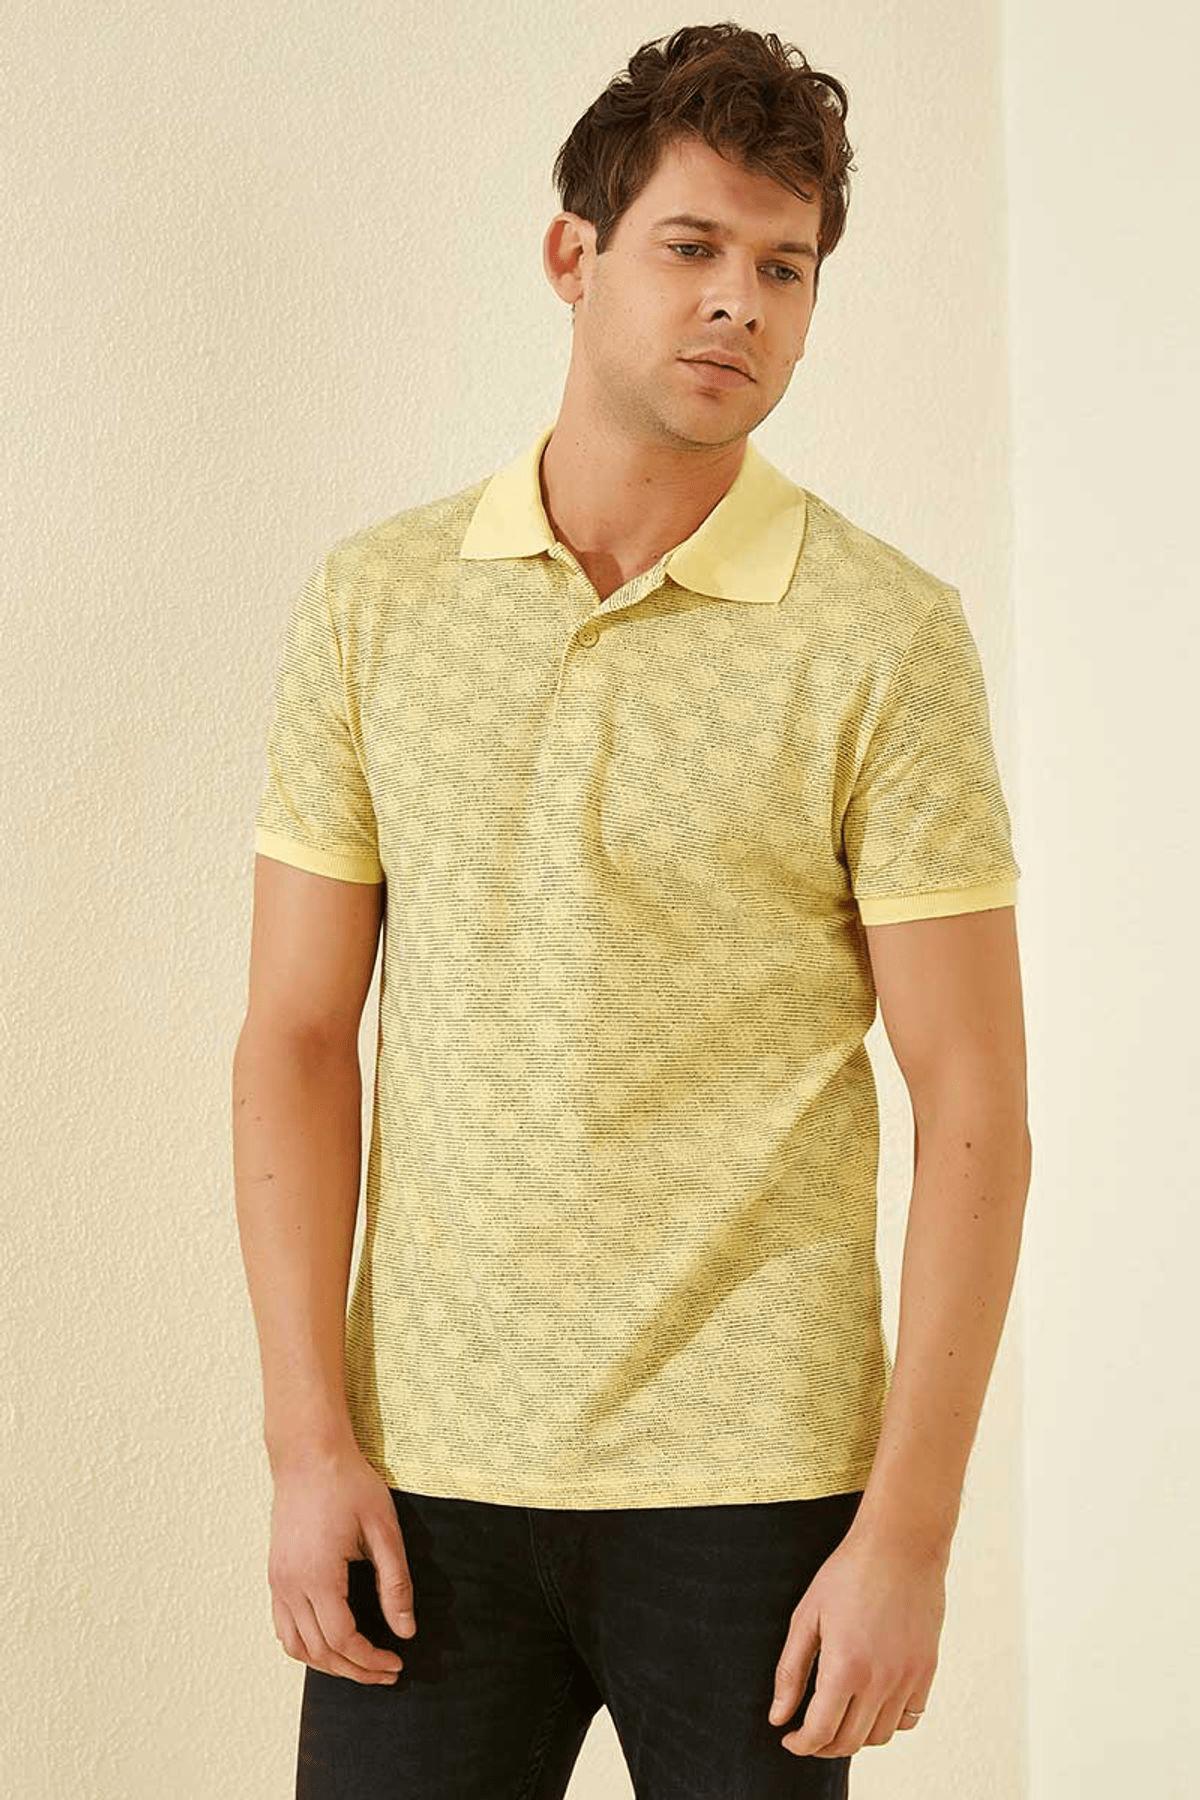 Tommy Life Baskılı Polo Yaka Sarı Erkek T-Shirt T08ER-87796_1 2